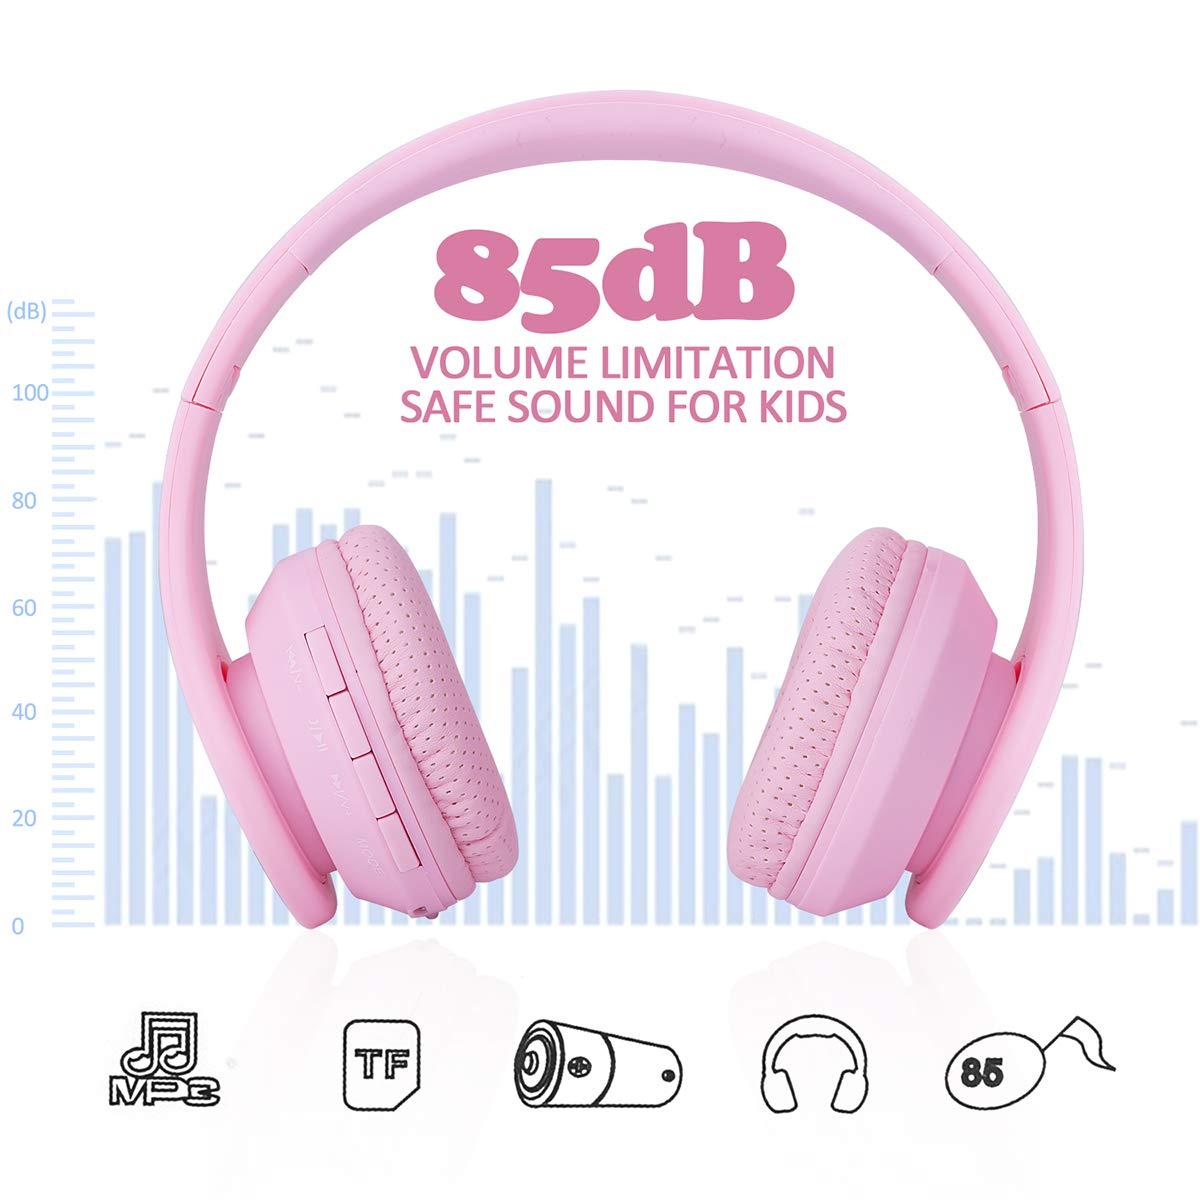 Auriculares Bluetooth para niños, Auriculares inalámbricos para niñas, 85 dB Volumen limitado Plegable, Auricular ligero sobre la oreja con micrófono Ranura ...